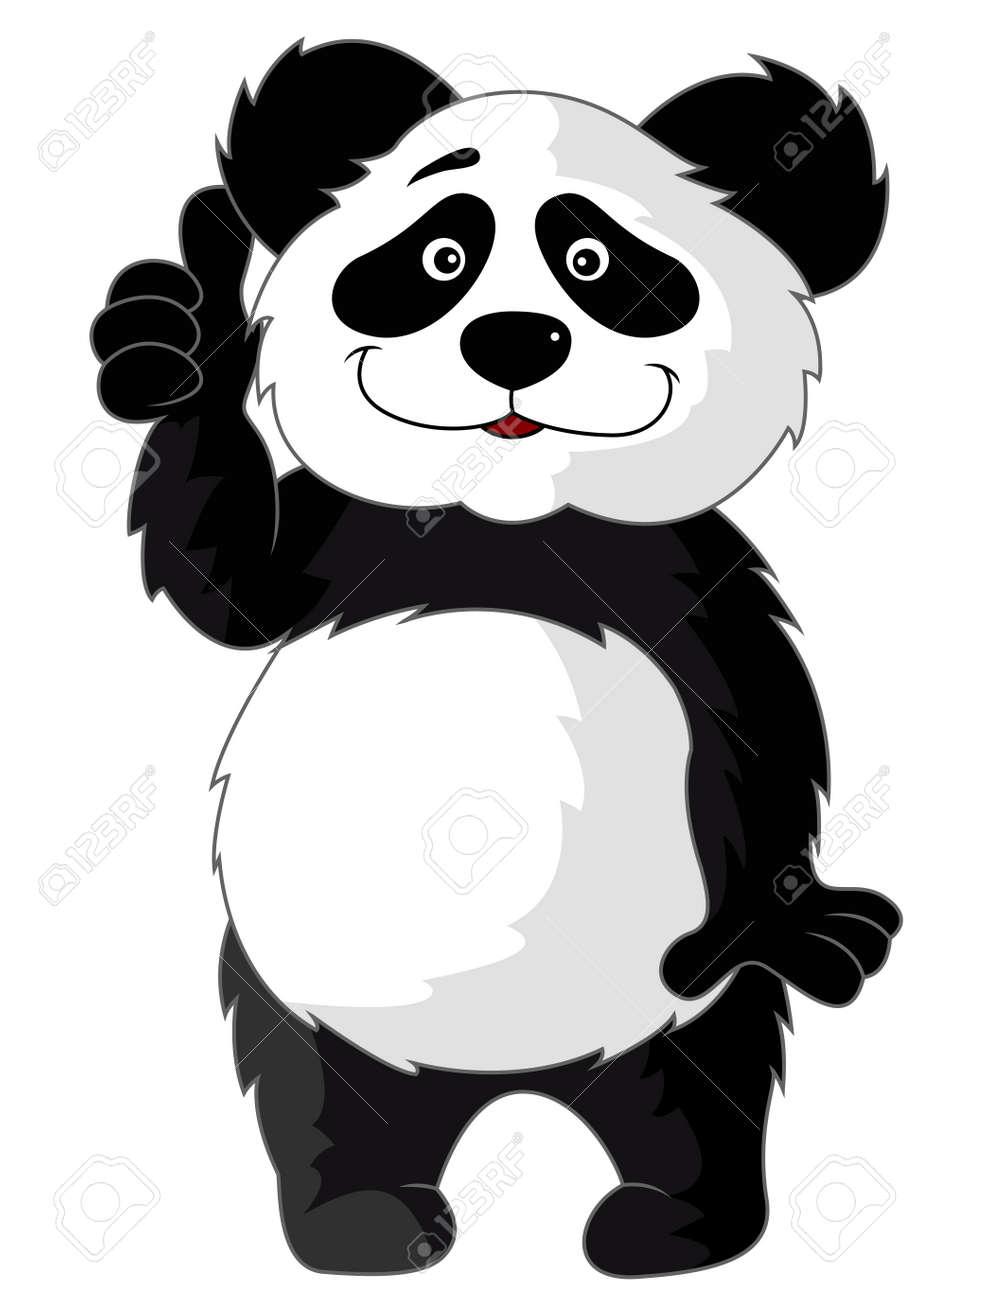 Panda cartoon with thumb up Stock Vector - 13393575